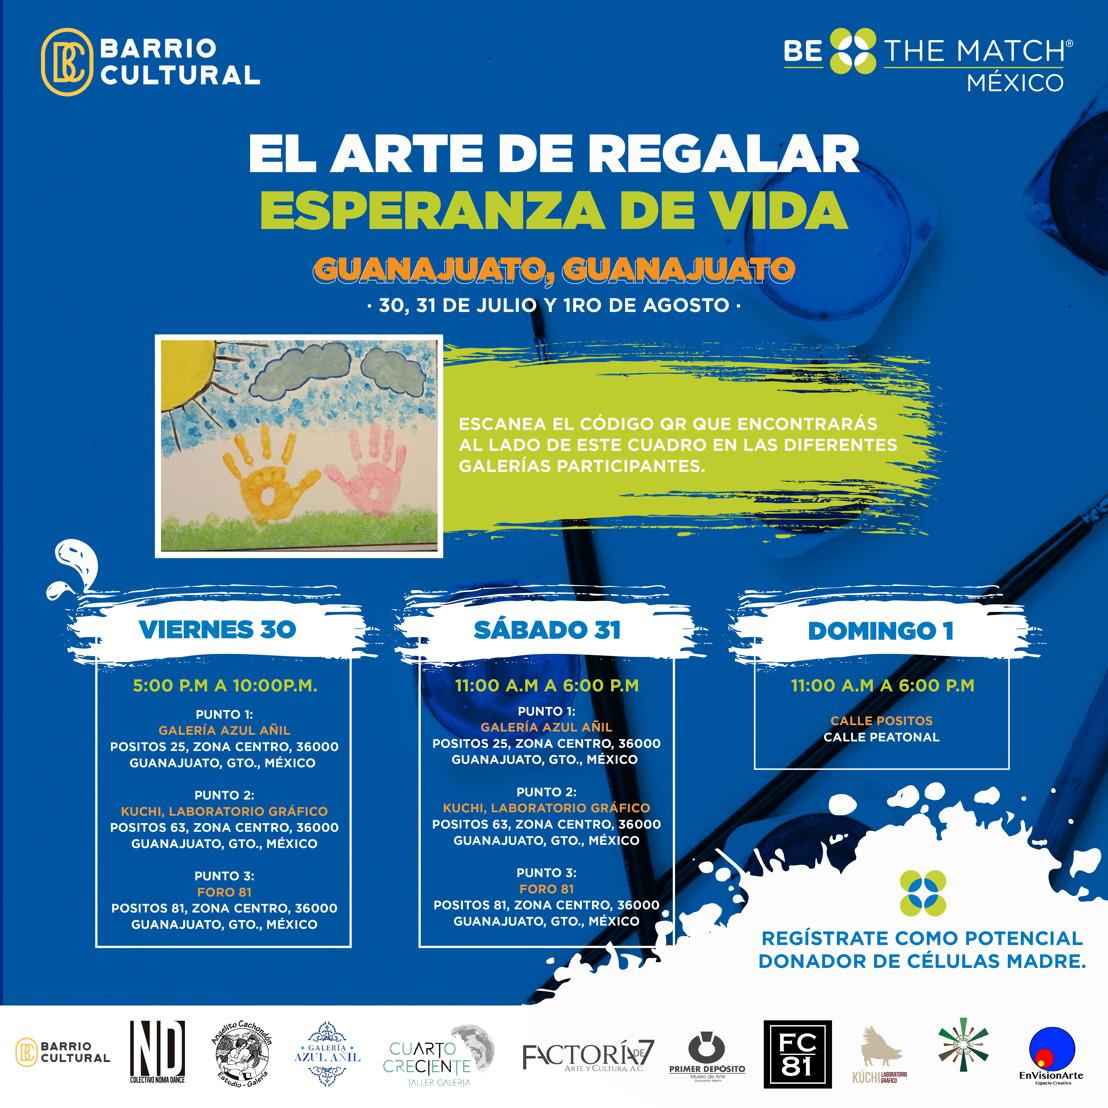 El arte de regalar esperanza de vida: En Guanajuato Be The Match México busca registrar posibles donadores de células madre.